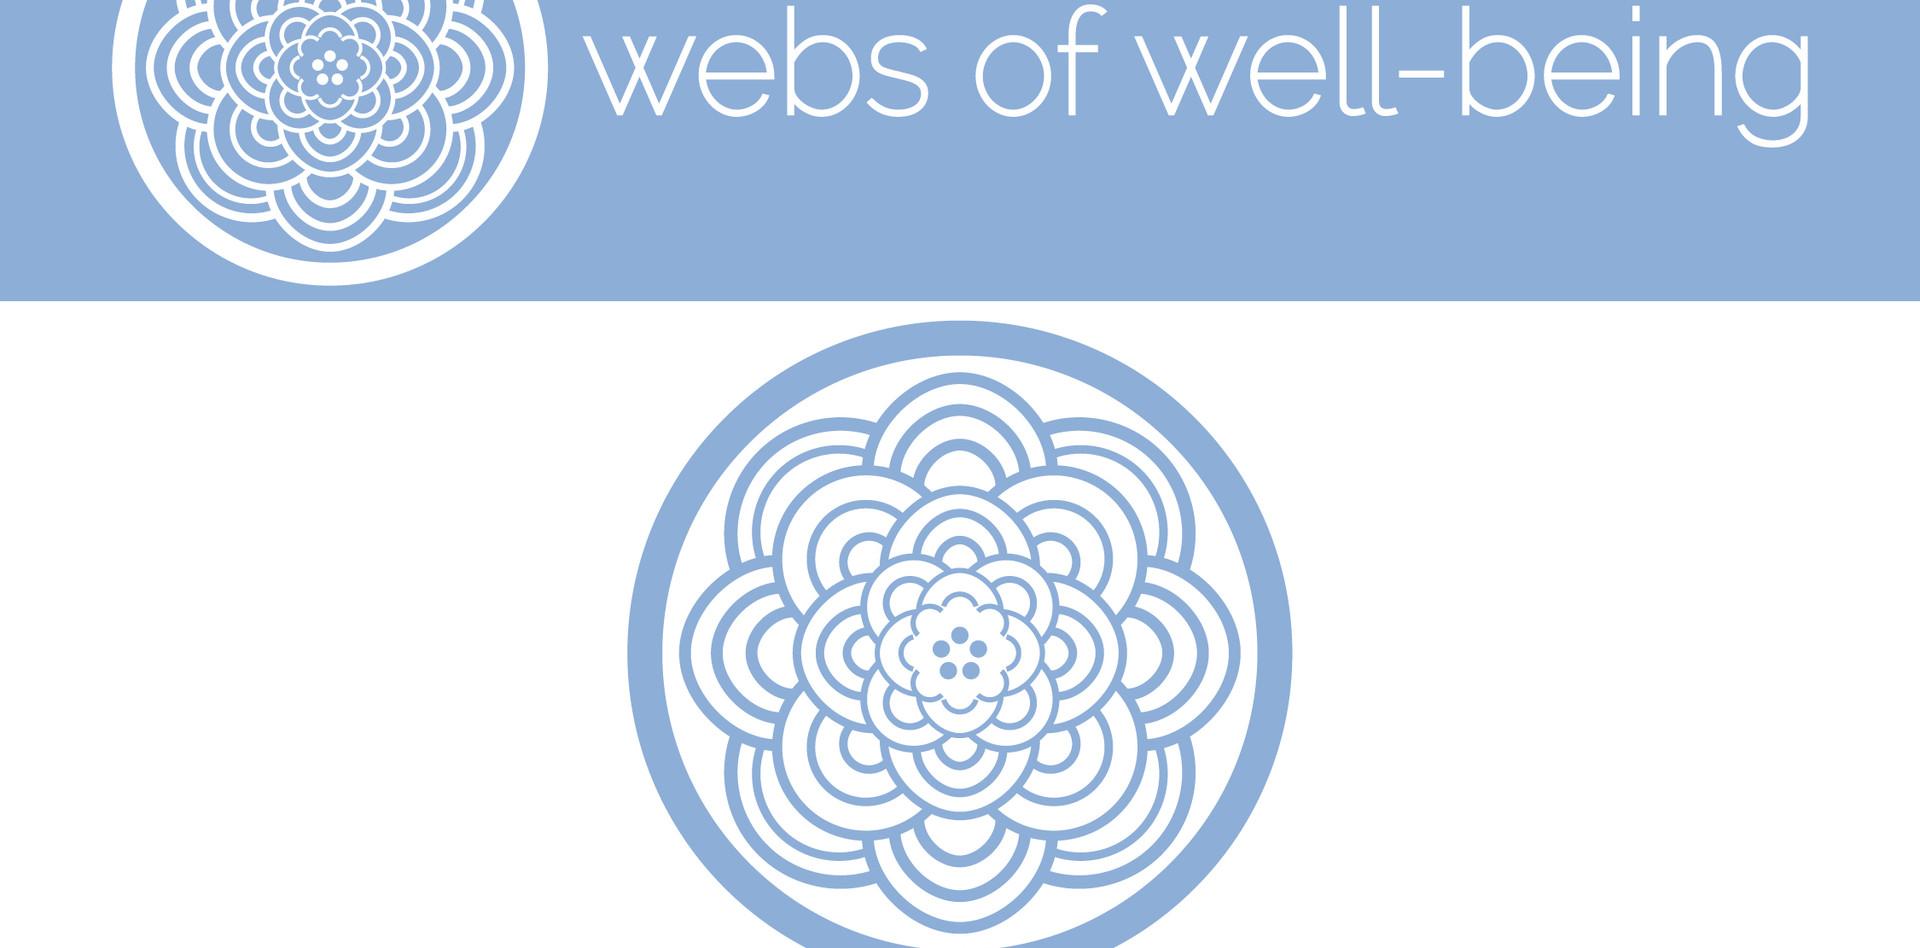 webs of well-being logo design (1/3)